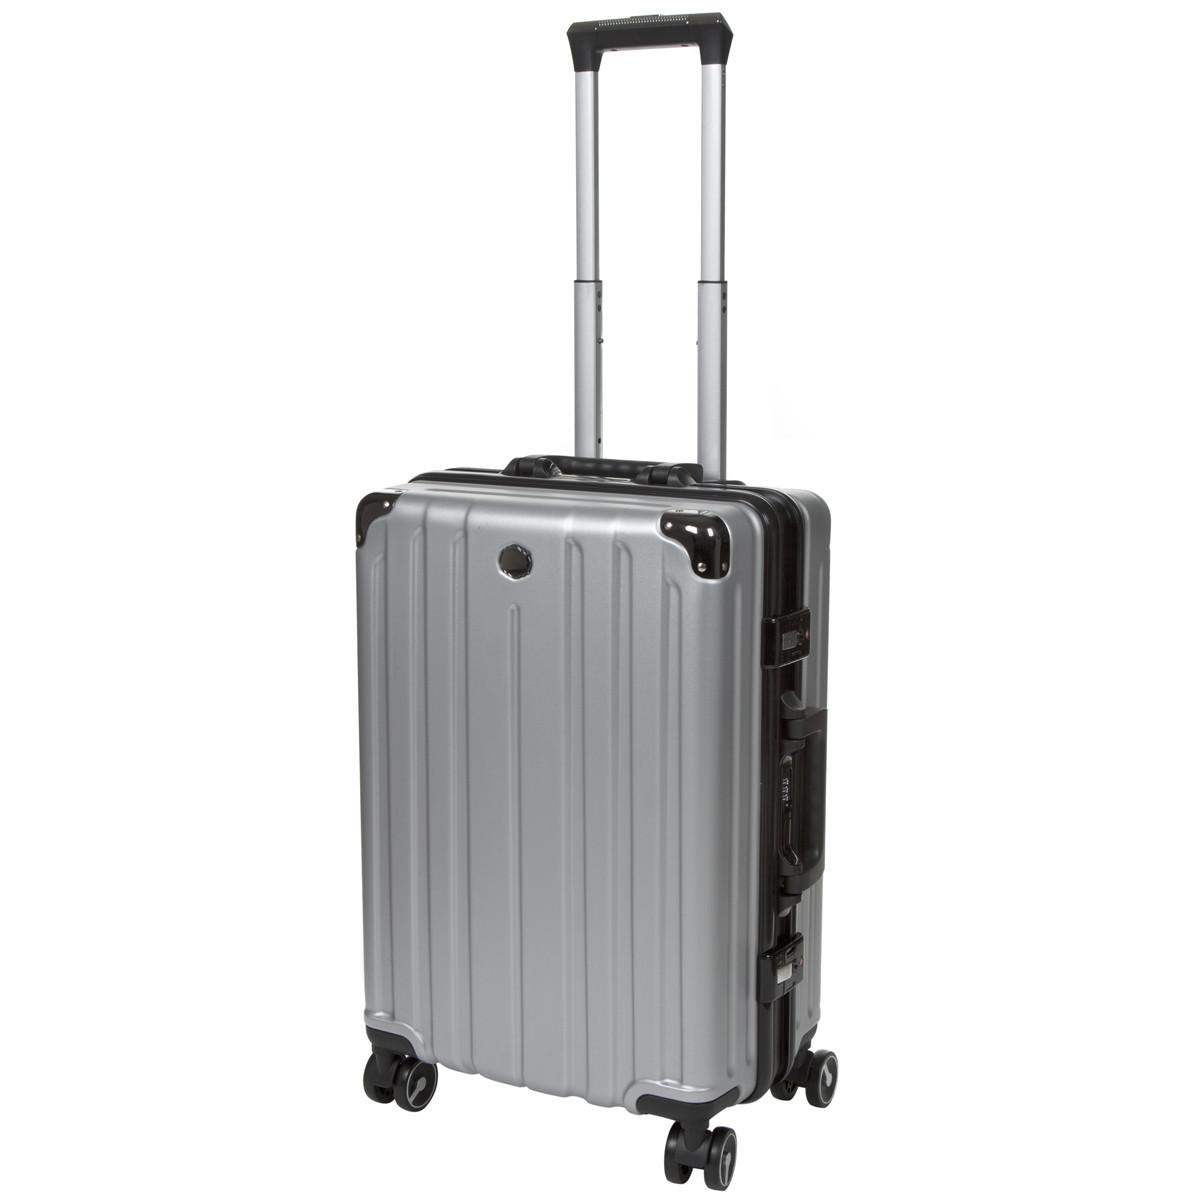 Чемодан малый серый OUPAI 40х62х24 пластик ABS алюминиевый каркас  кс1106-1серм